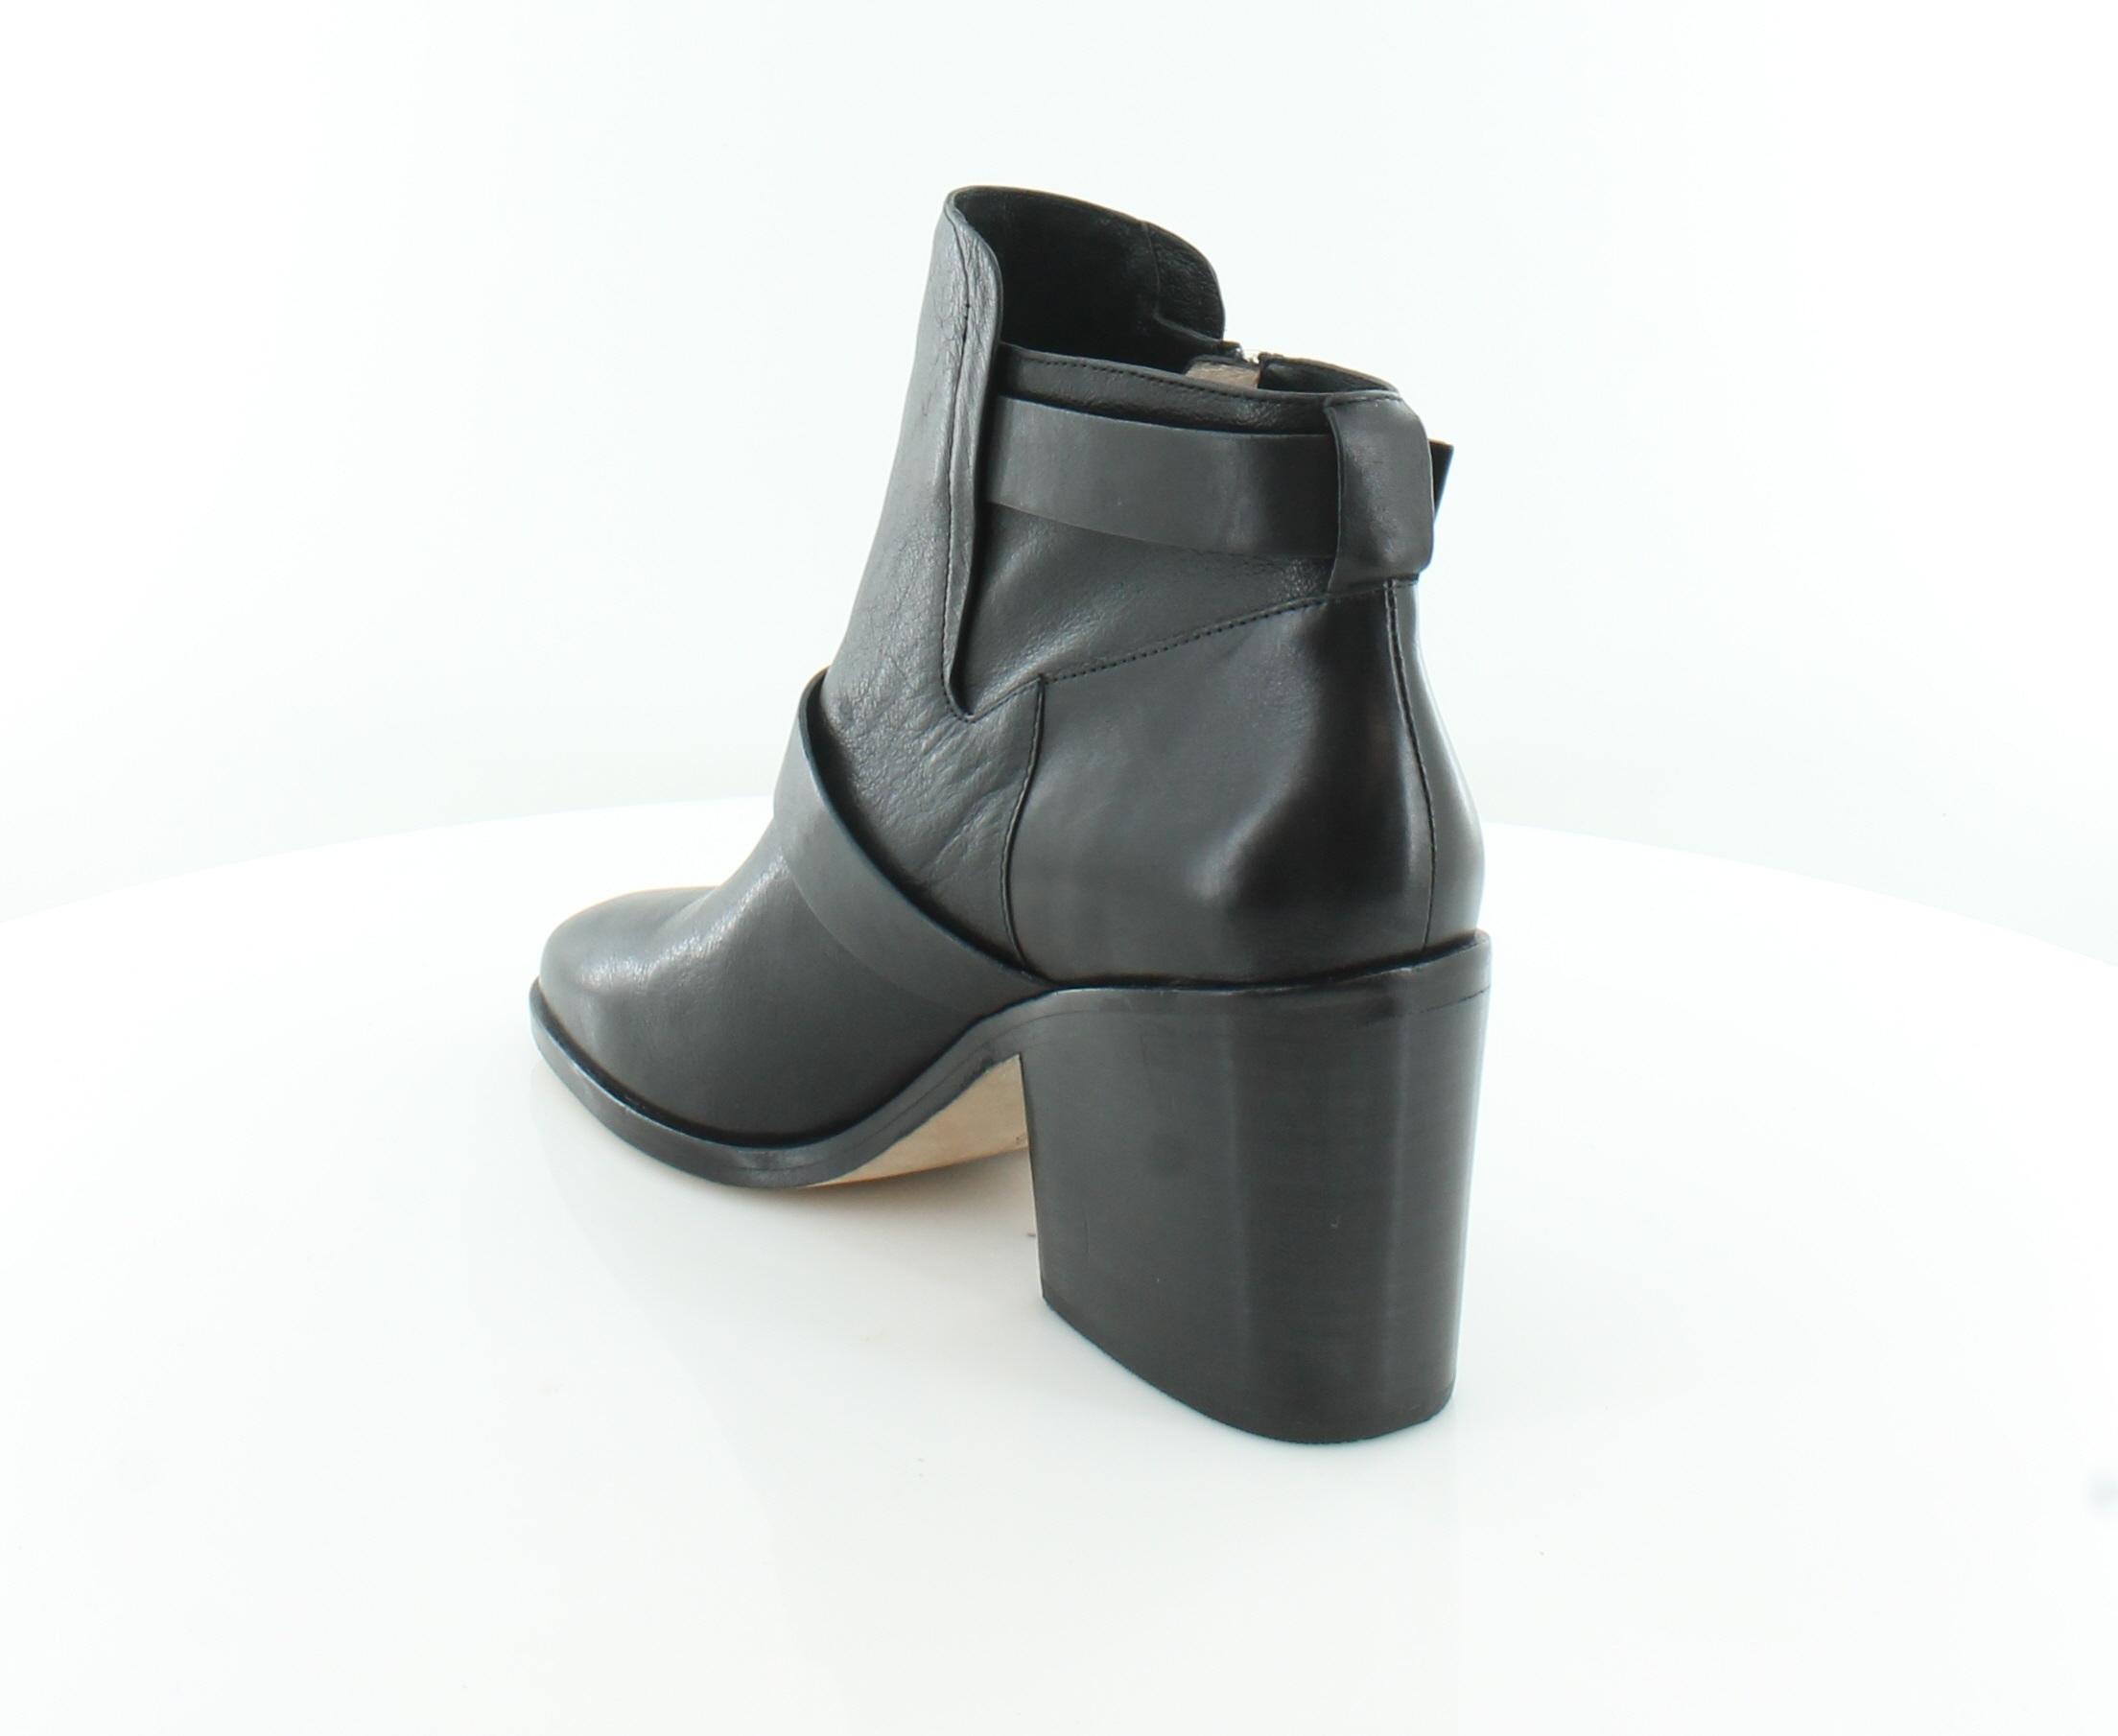 Pour La Victoire Wilson Negro 8.5 Zapatos para mujer Talla 8.5 Negro M botas MSRP  375 d9430e